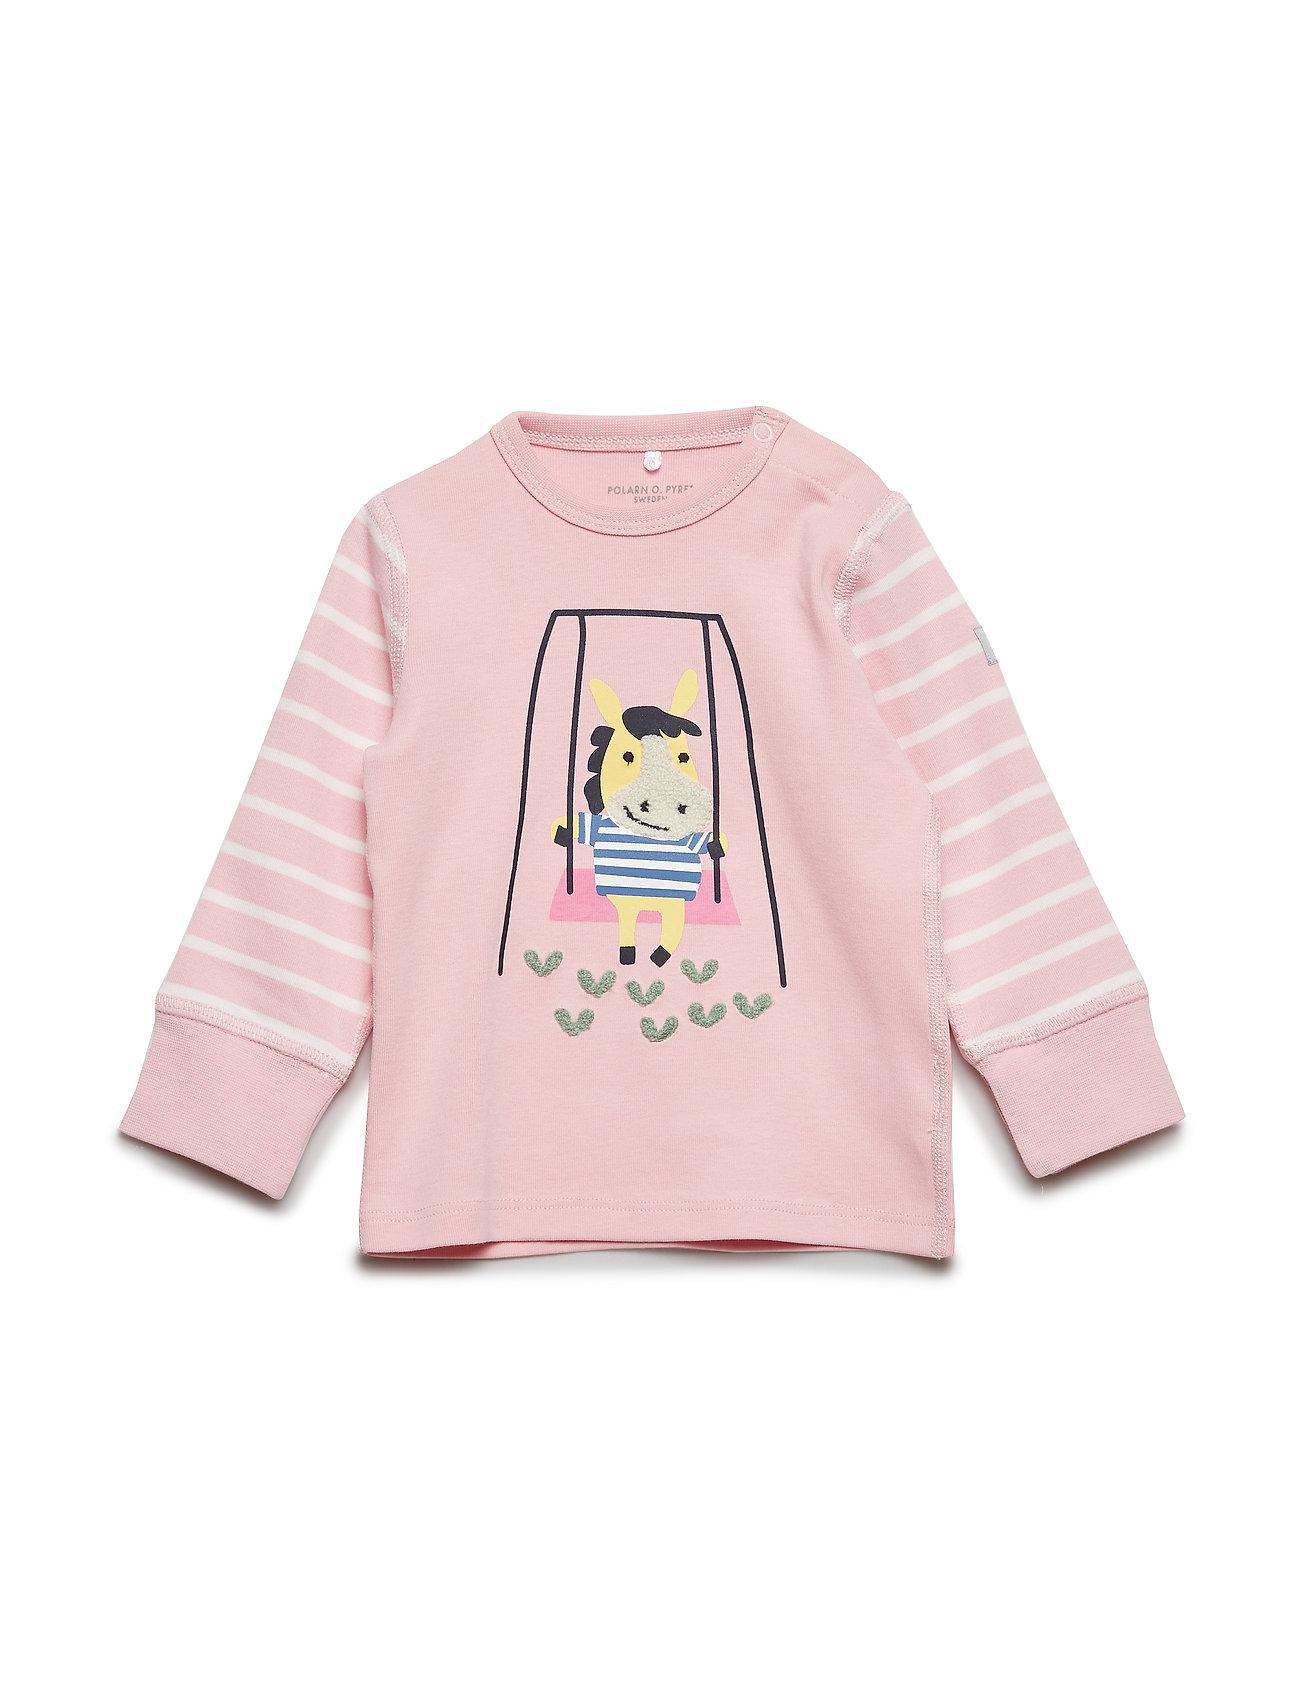 Polarn O. Pyret T-shirt Long Sleeve PO.P Stripe Baby